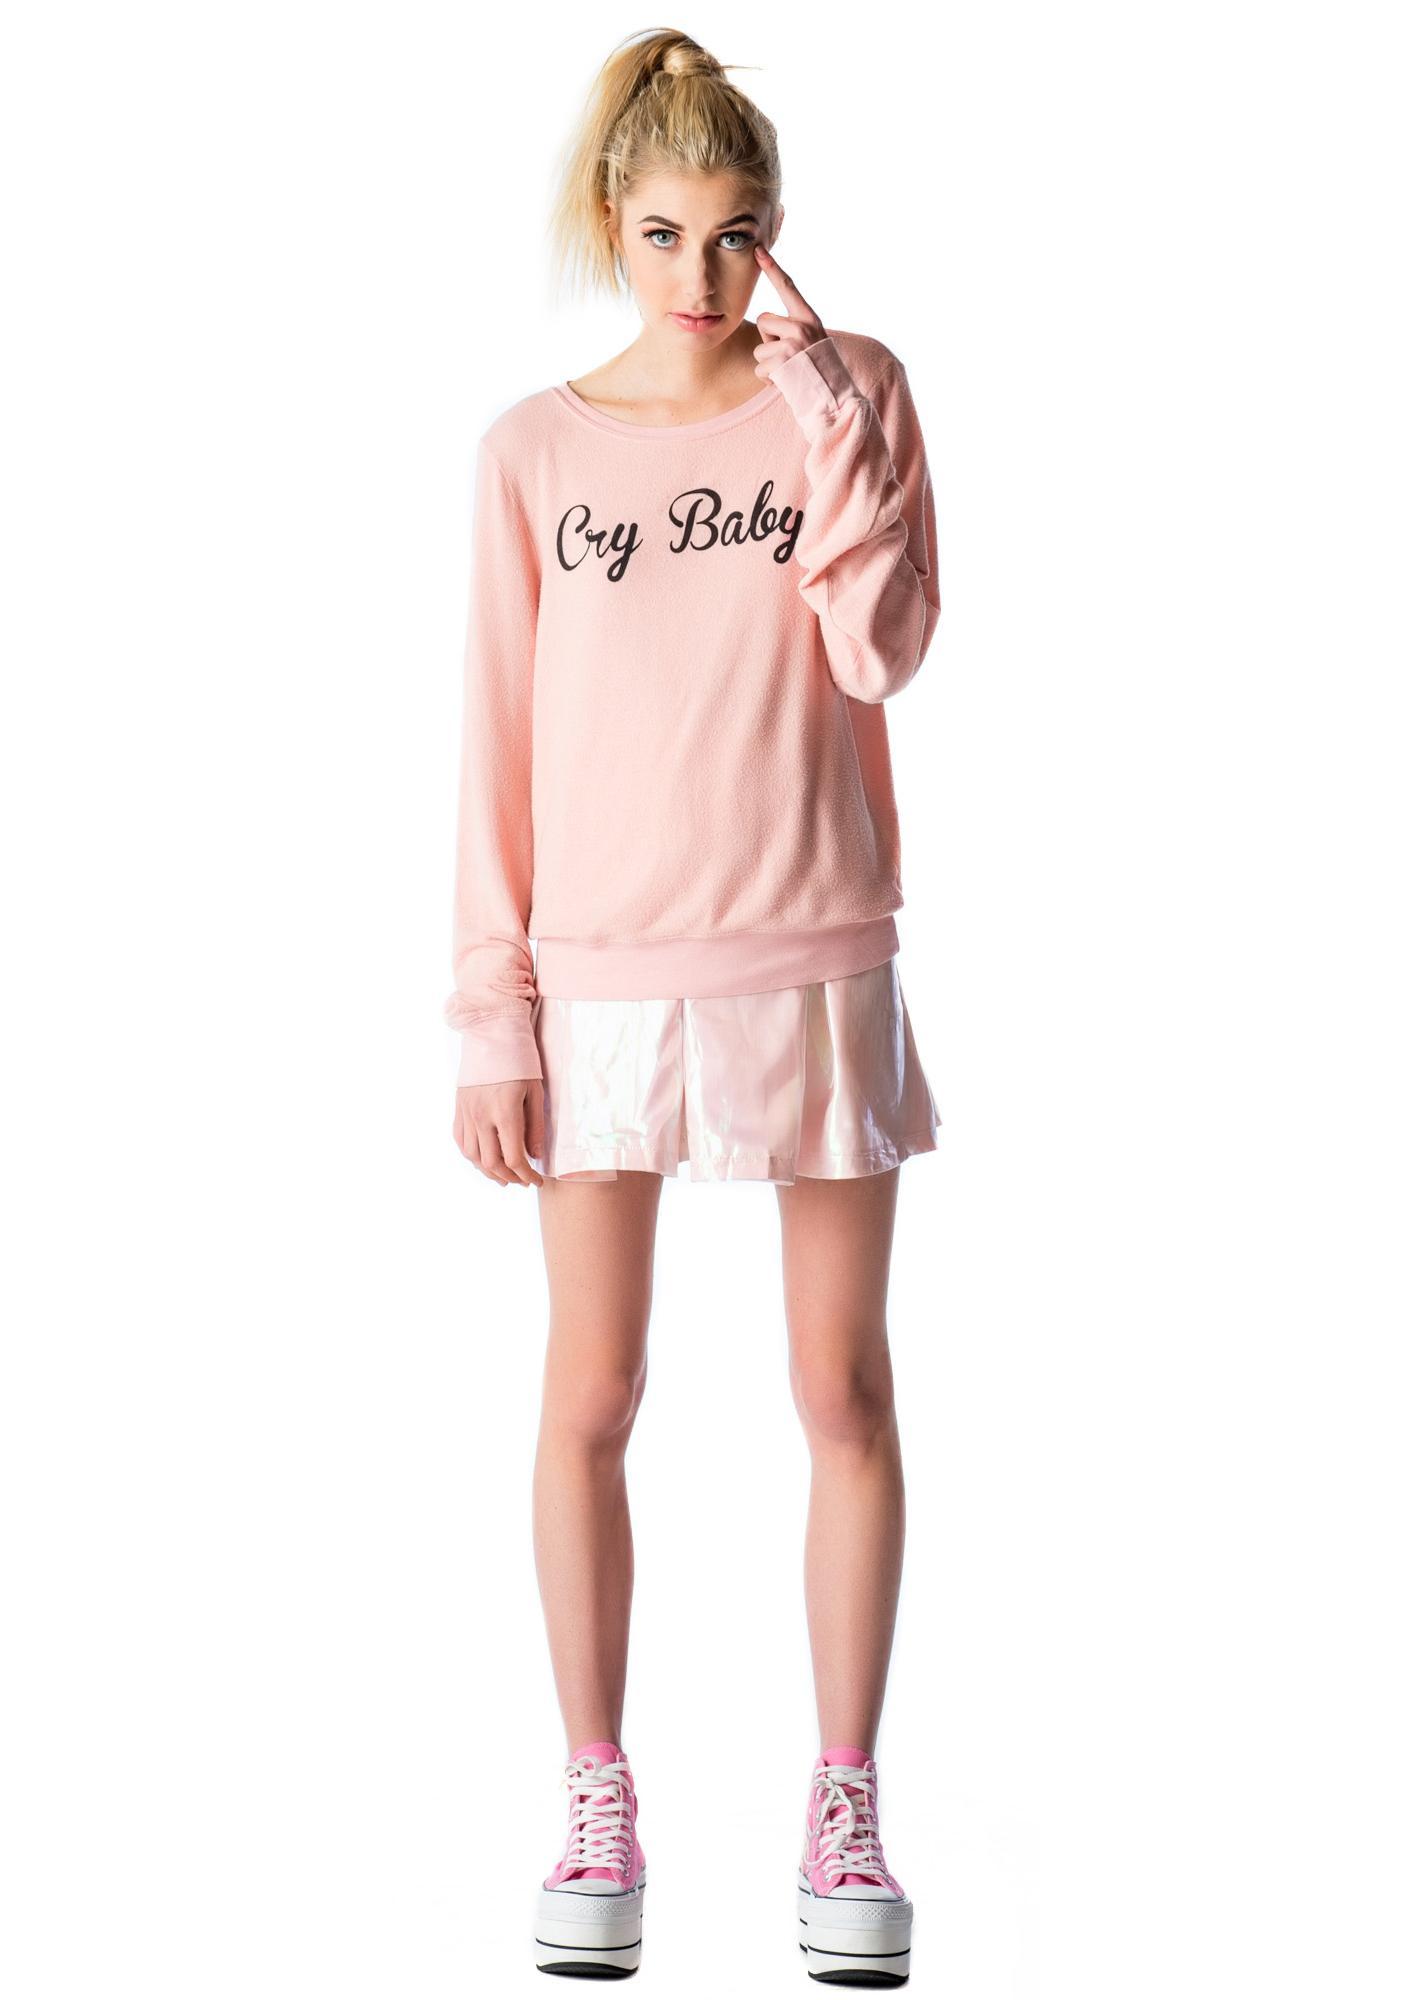 dfa09b17de61 Wildfox Couture Cry Baby Baggy Beach Jumper